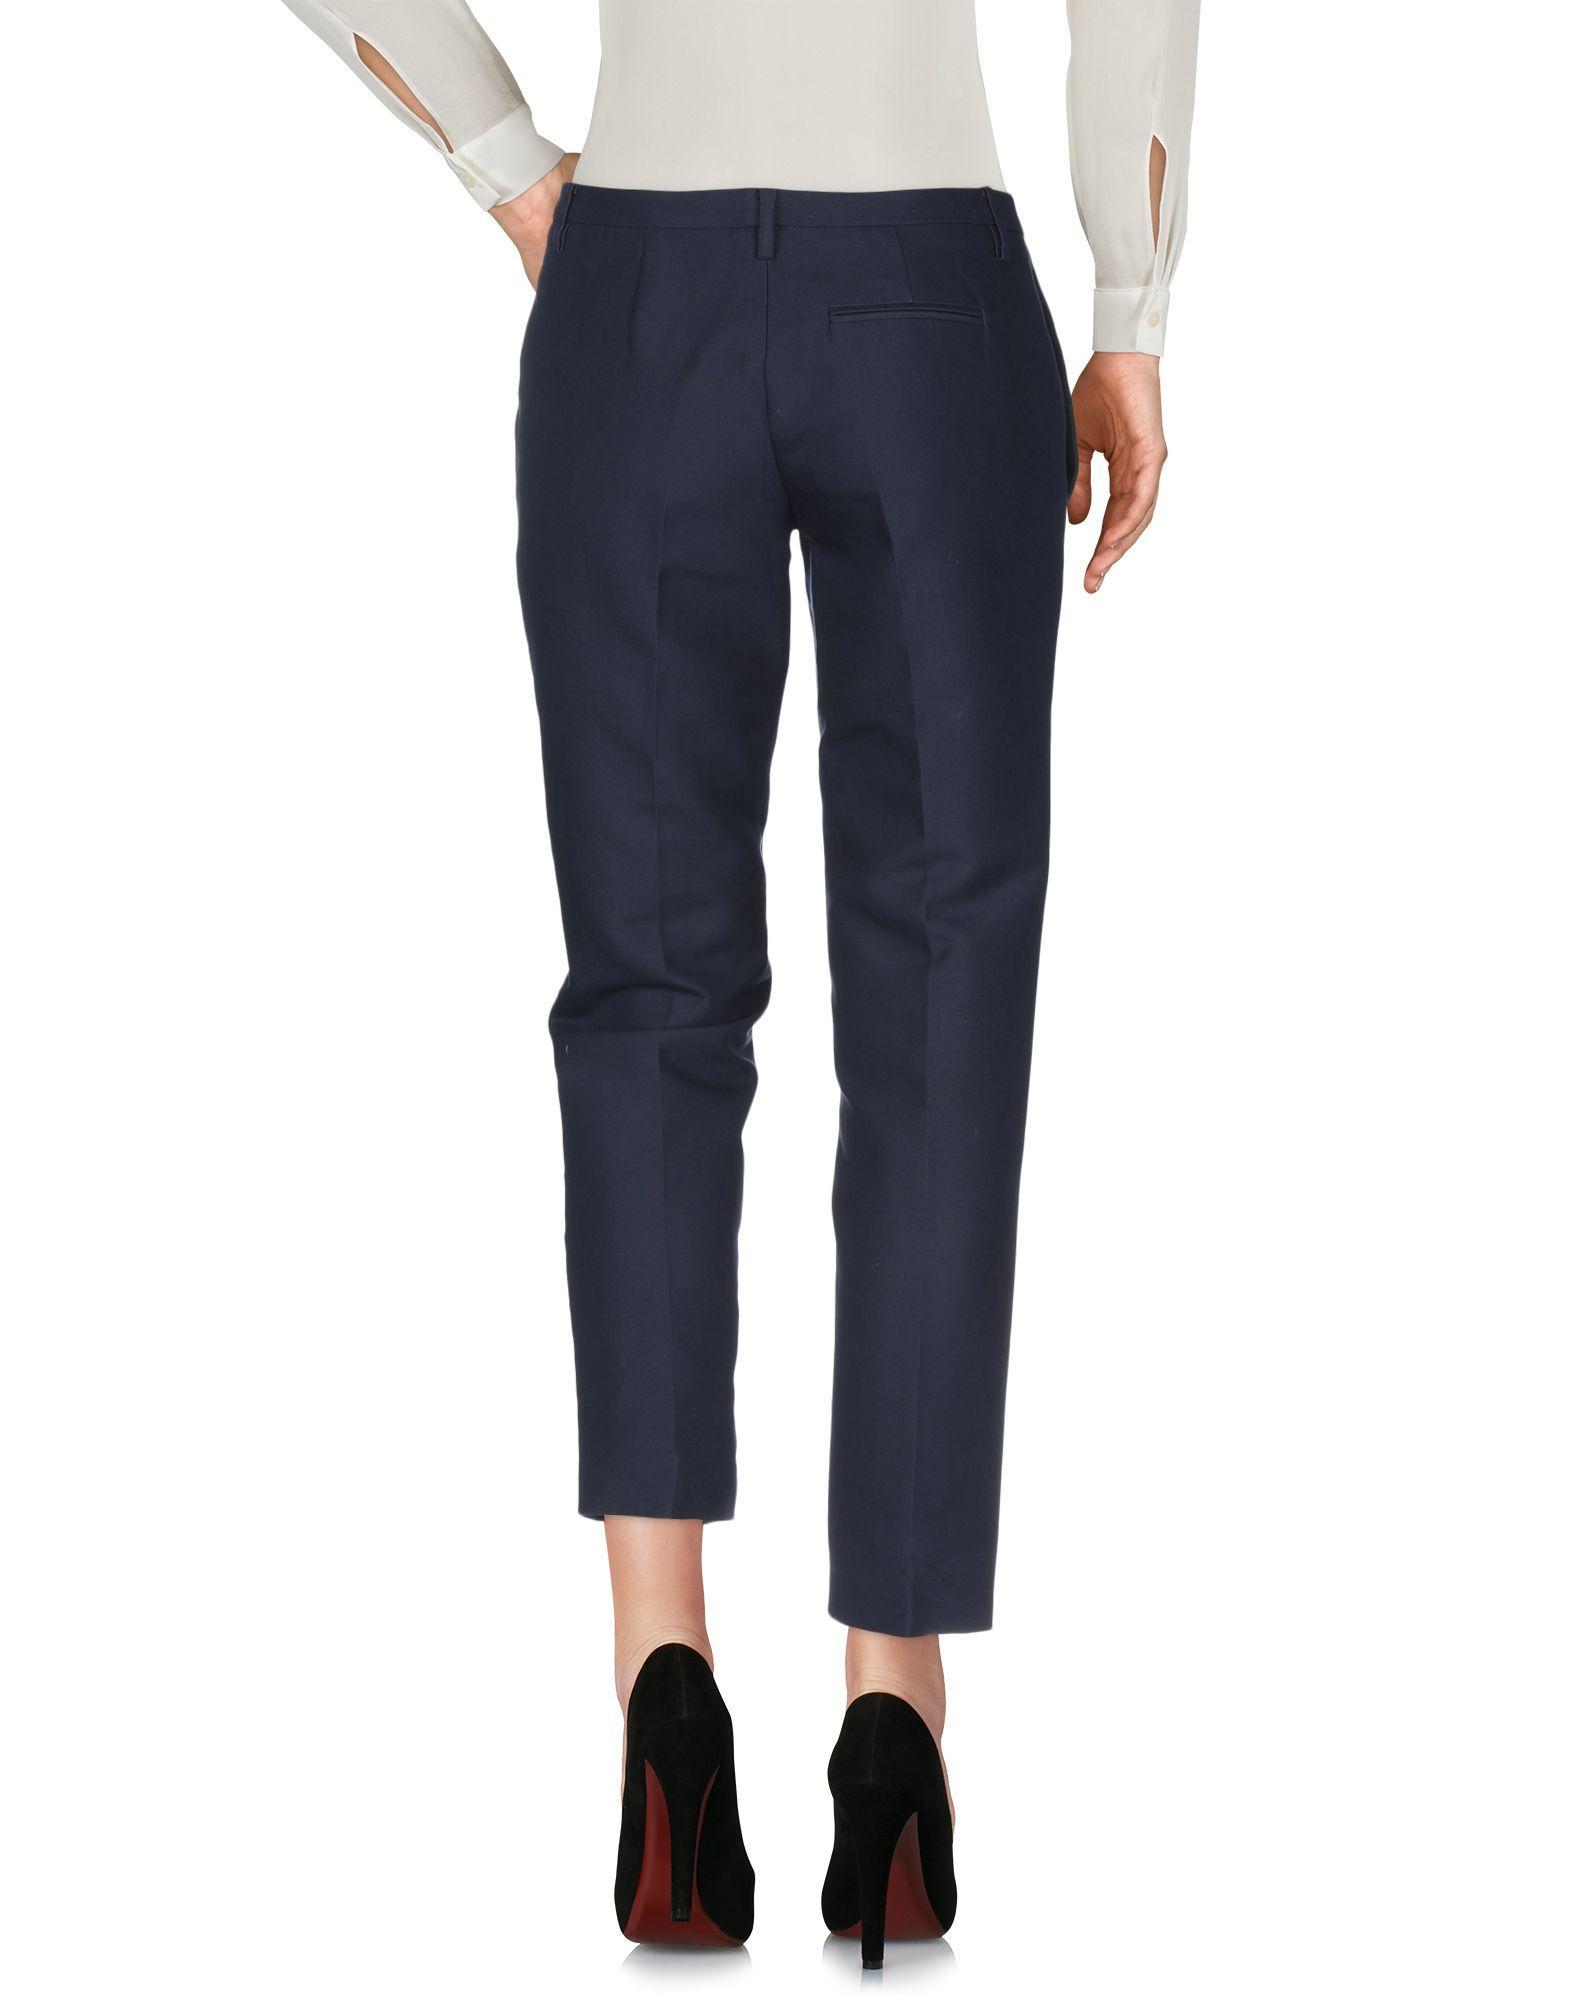 Pantalones N°21 de color Azul